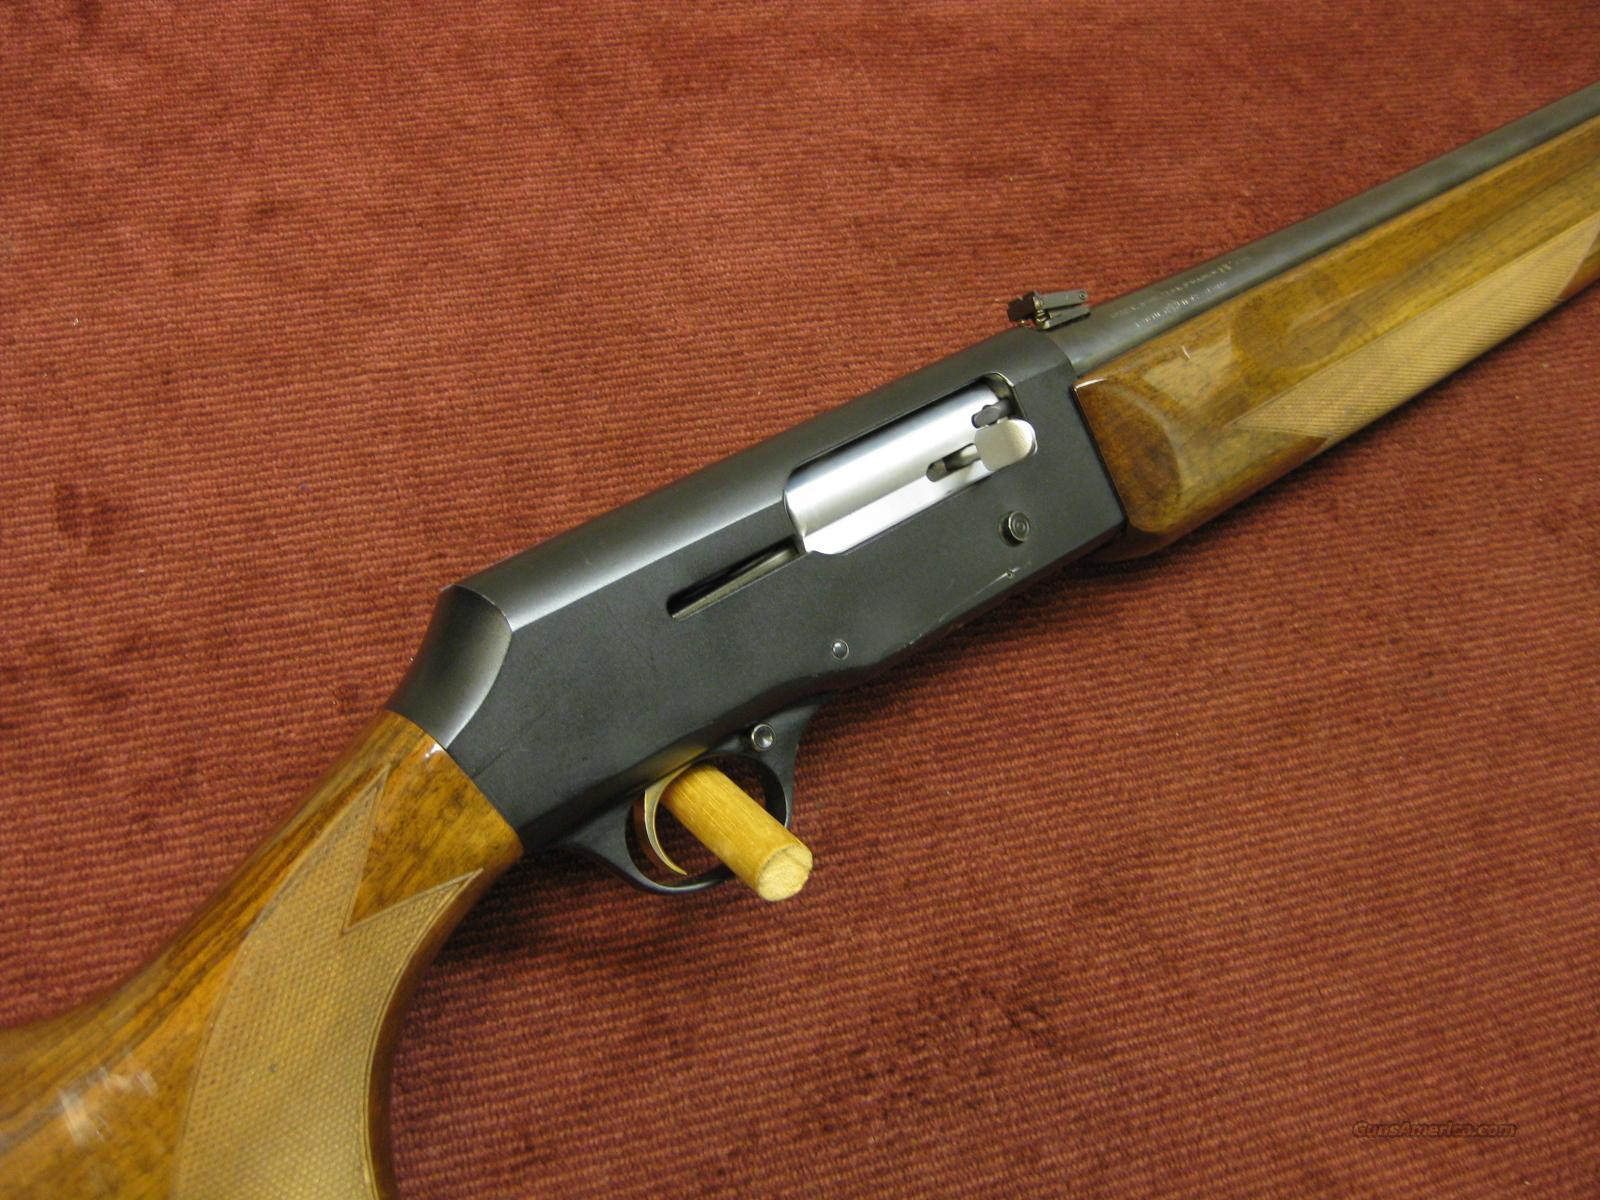 BROWINING B-80 12GA. DEER SLUG GUN - EXCELLENT for sale